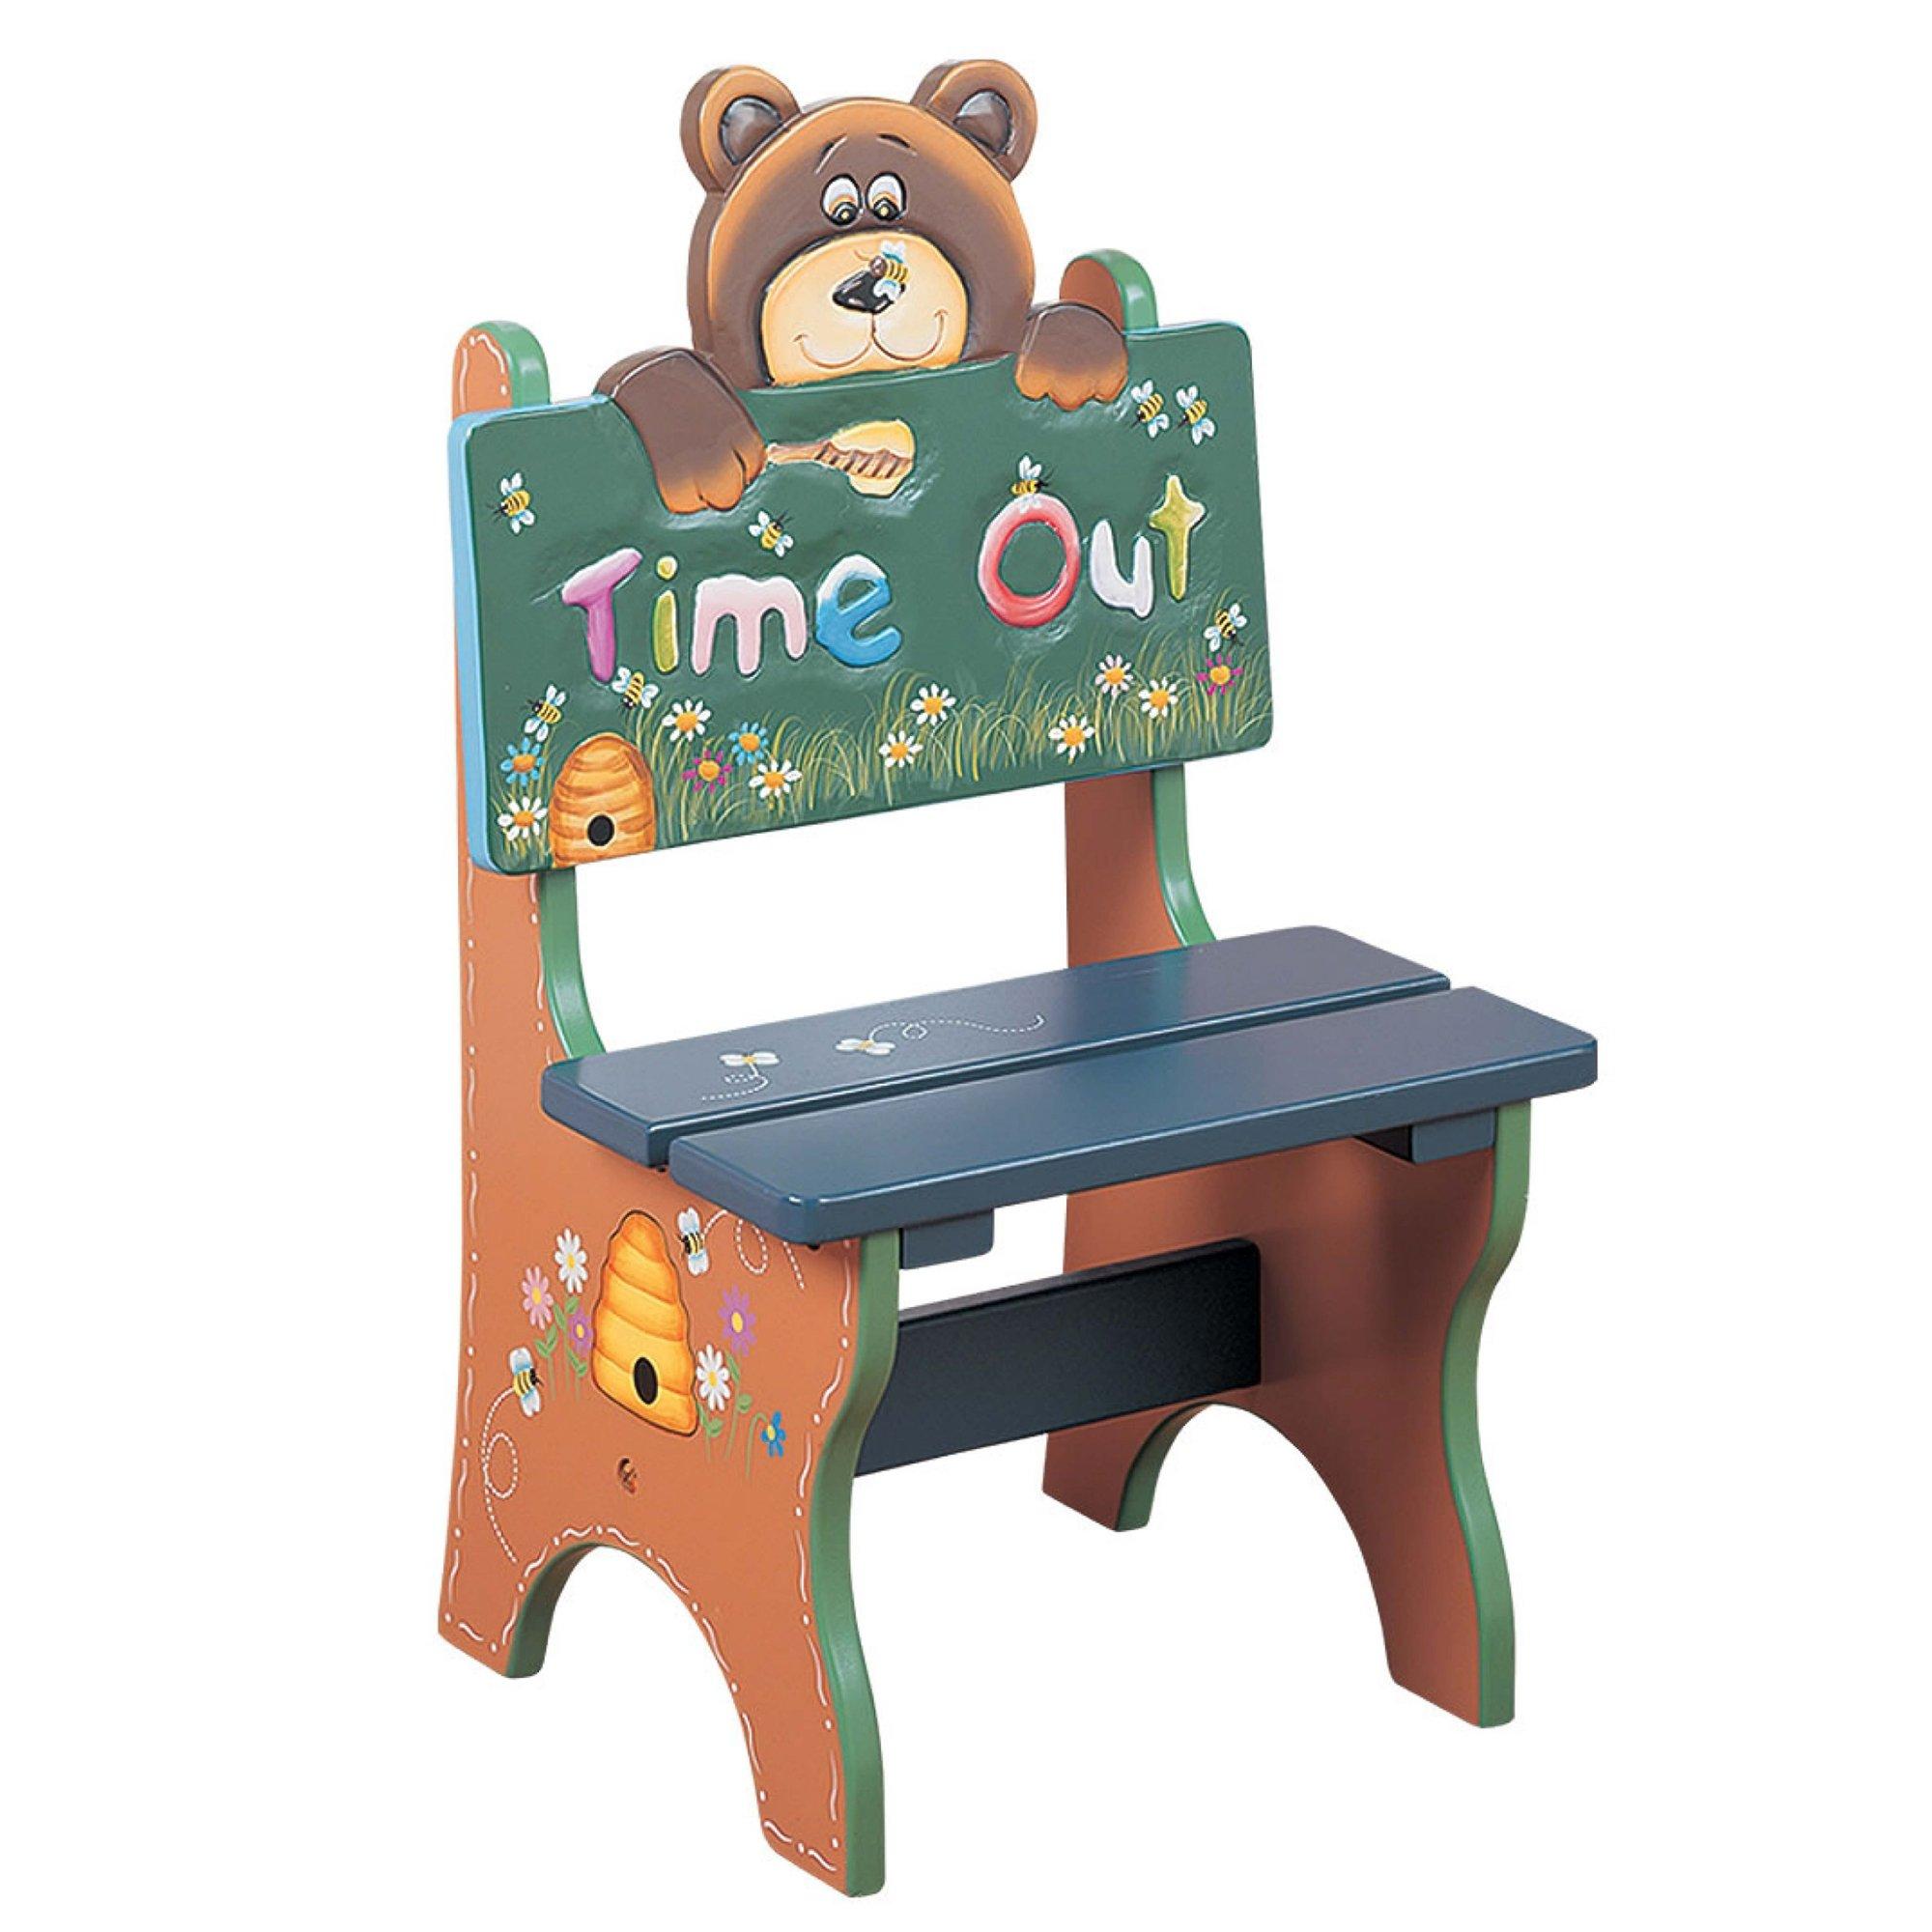 Teamson Kids - Safari Kids Wooden Time Out Chair - Bear